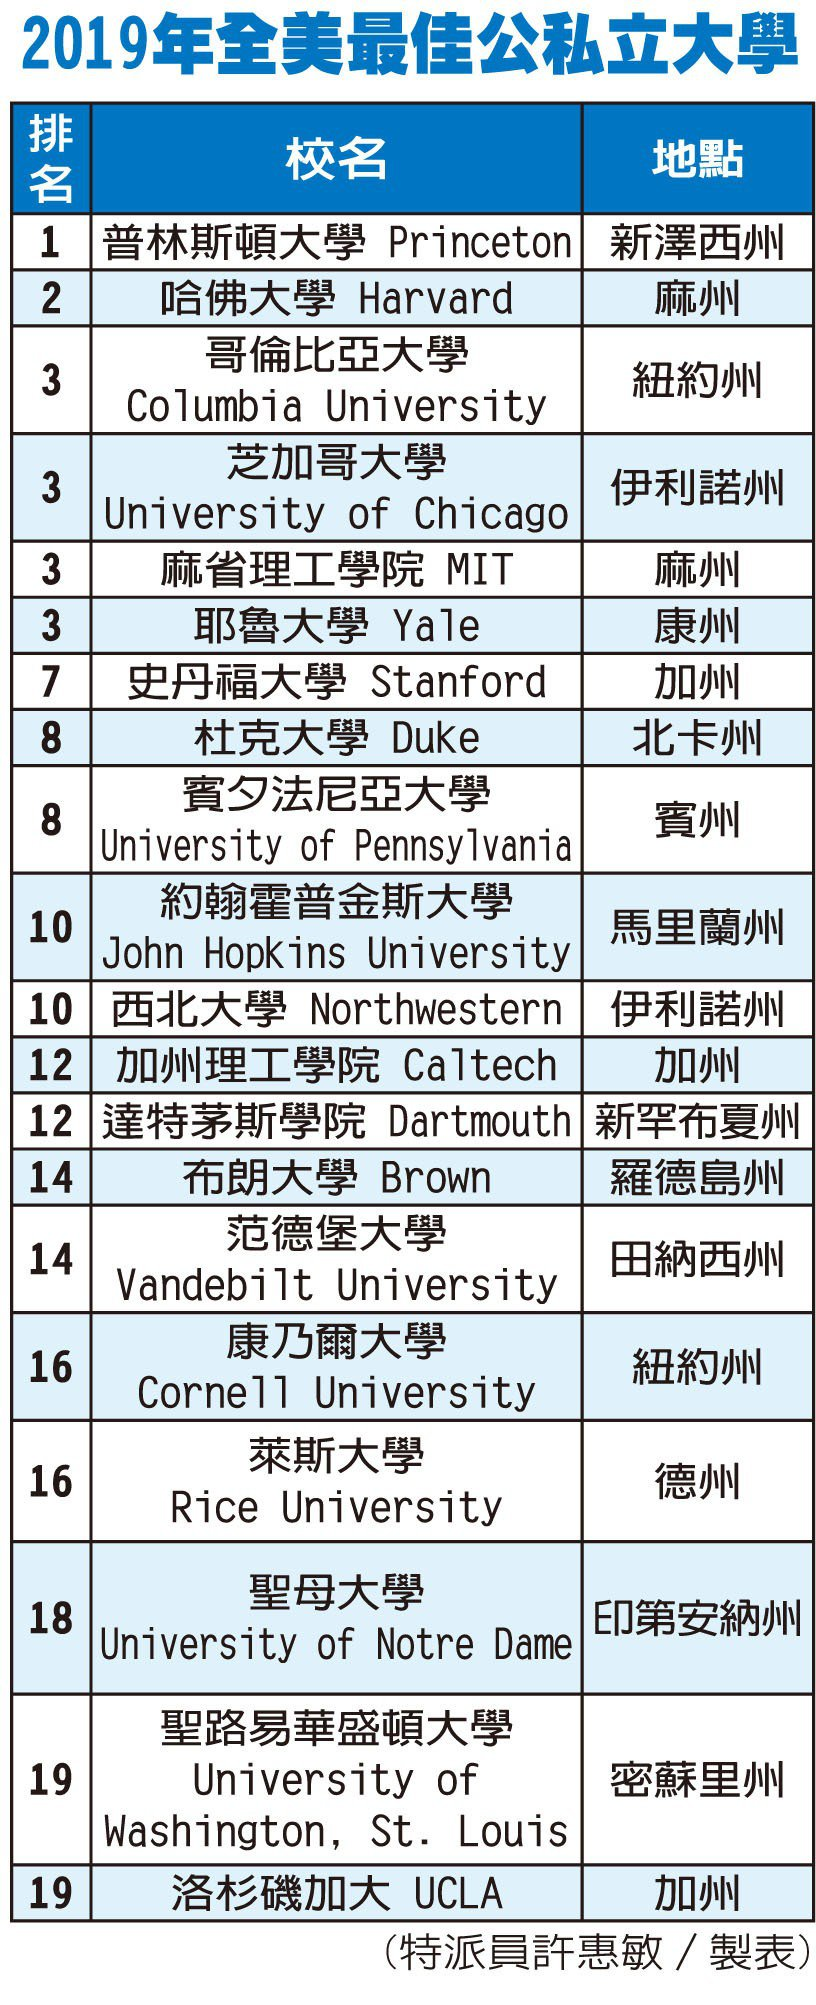 UCLA超越柏克萊加大,成為美國最佳公立大學。 世界日報記者陳玉鵬/制表